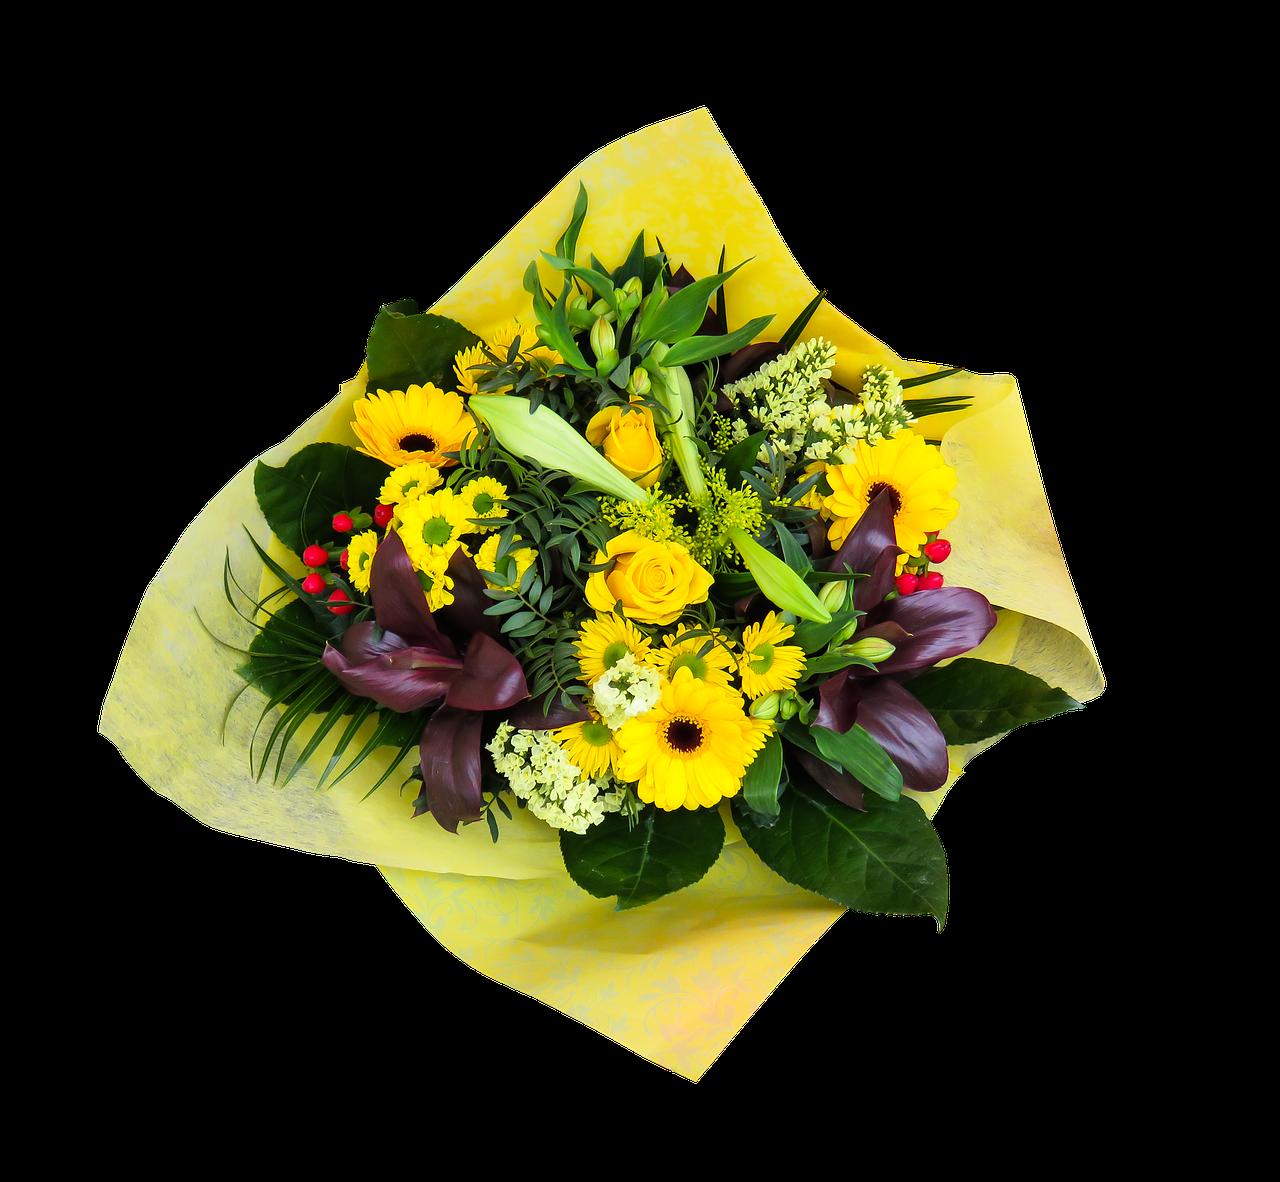 Mazzo Di Fiori Emoticon.Emotion Love Bouquet Birthday Bouquet Flowers Free Photo From